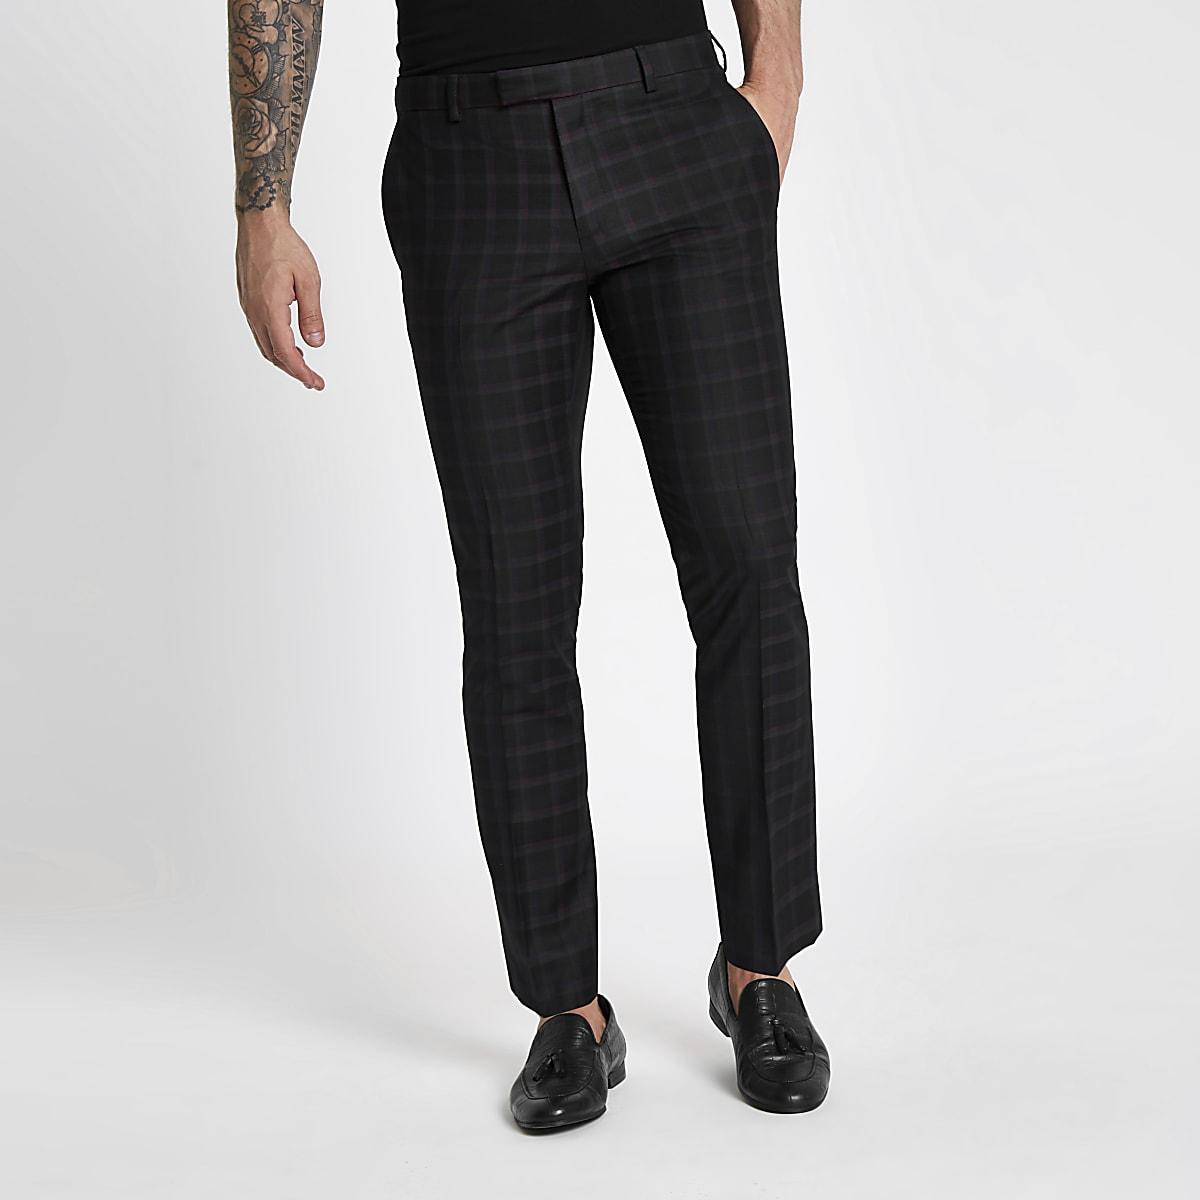 Black and burgundy check skinny suit pants